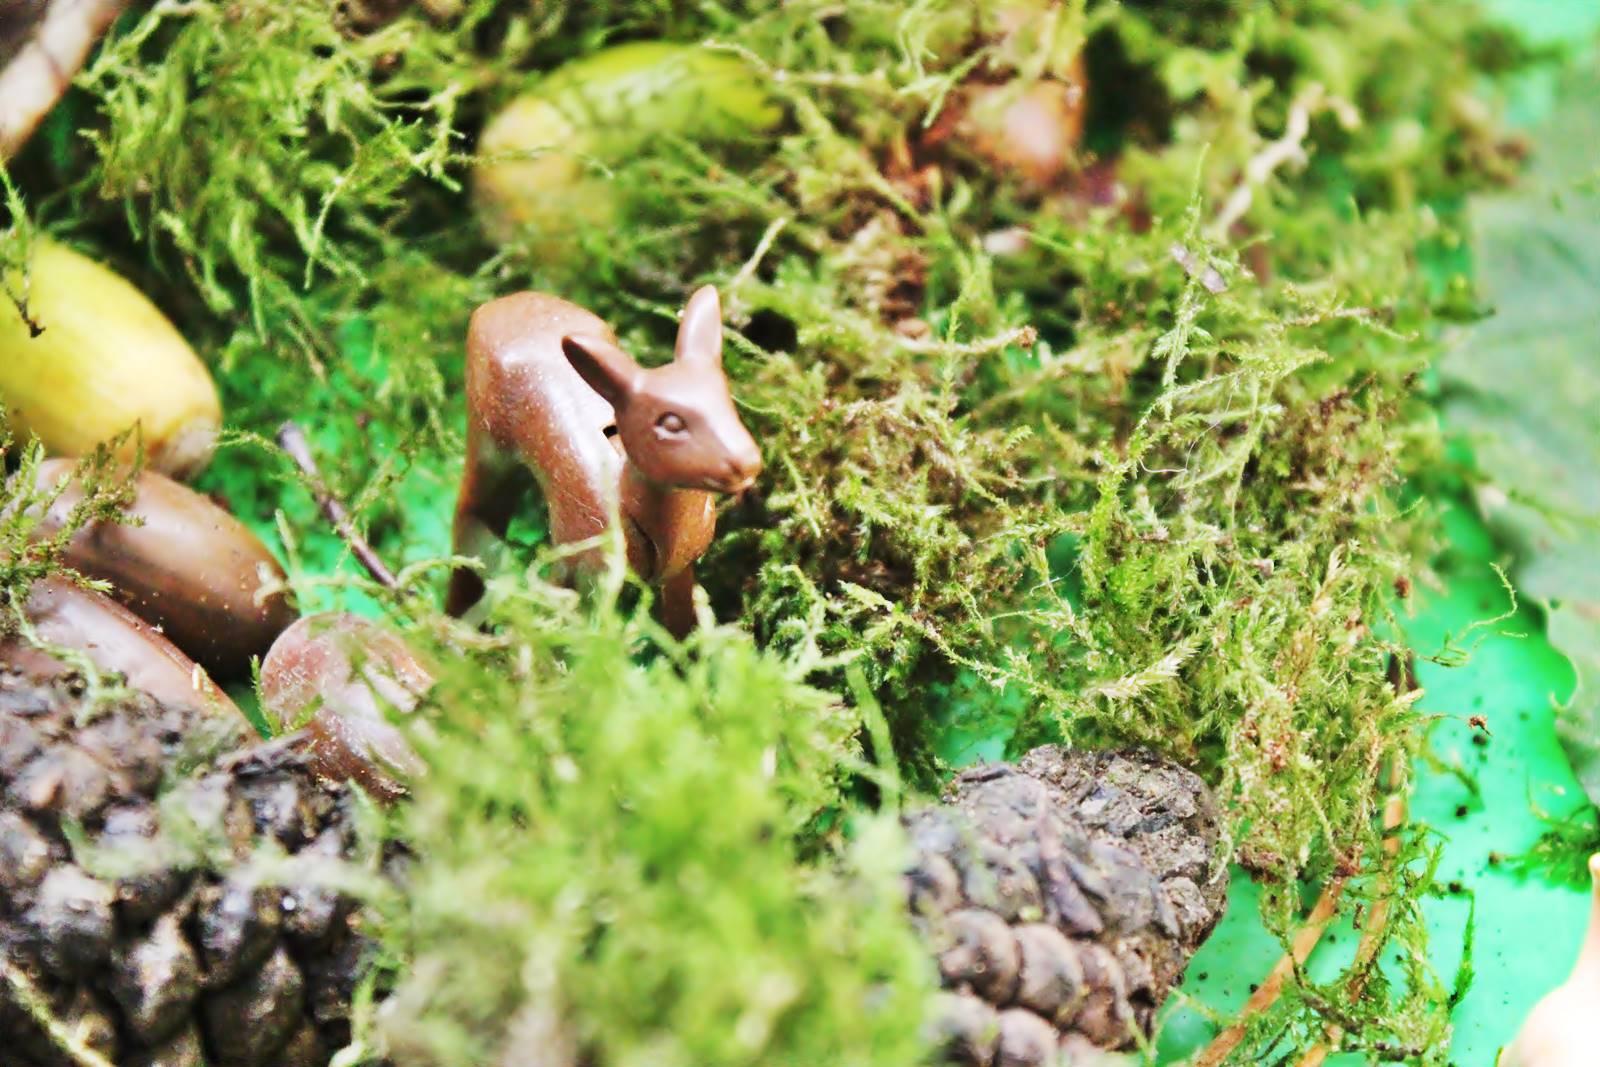 Table des saisons steiner waldorf ief homescooling ecole maison automne 7